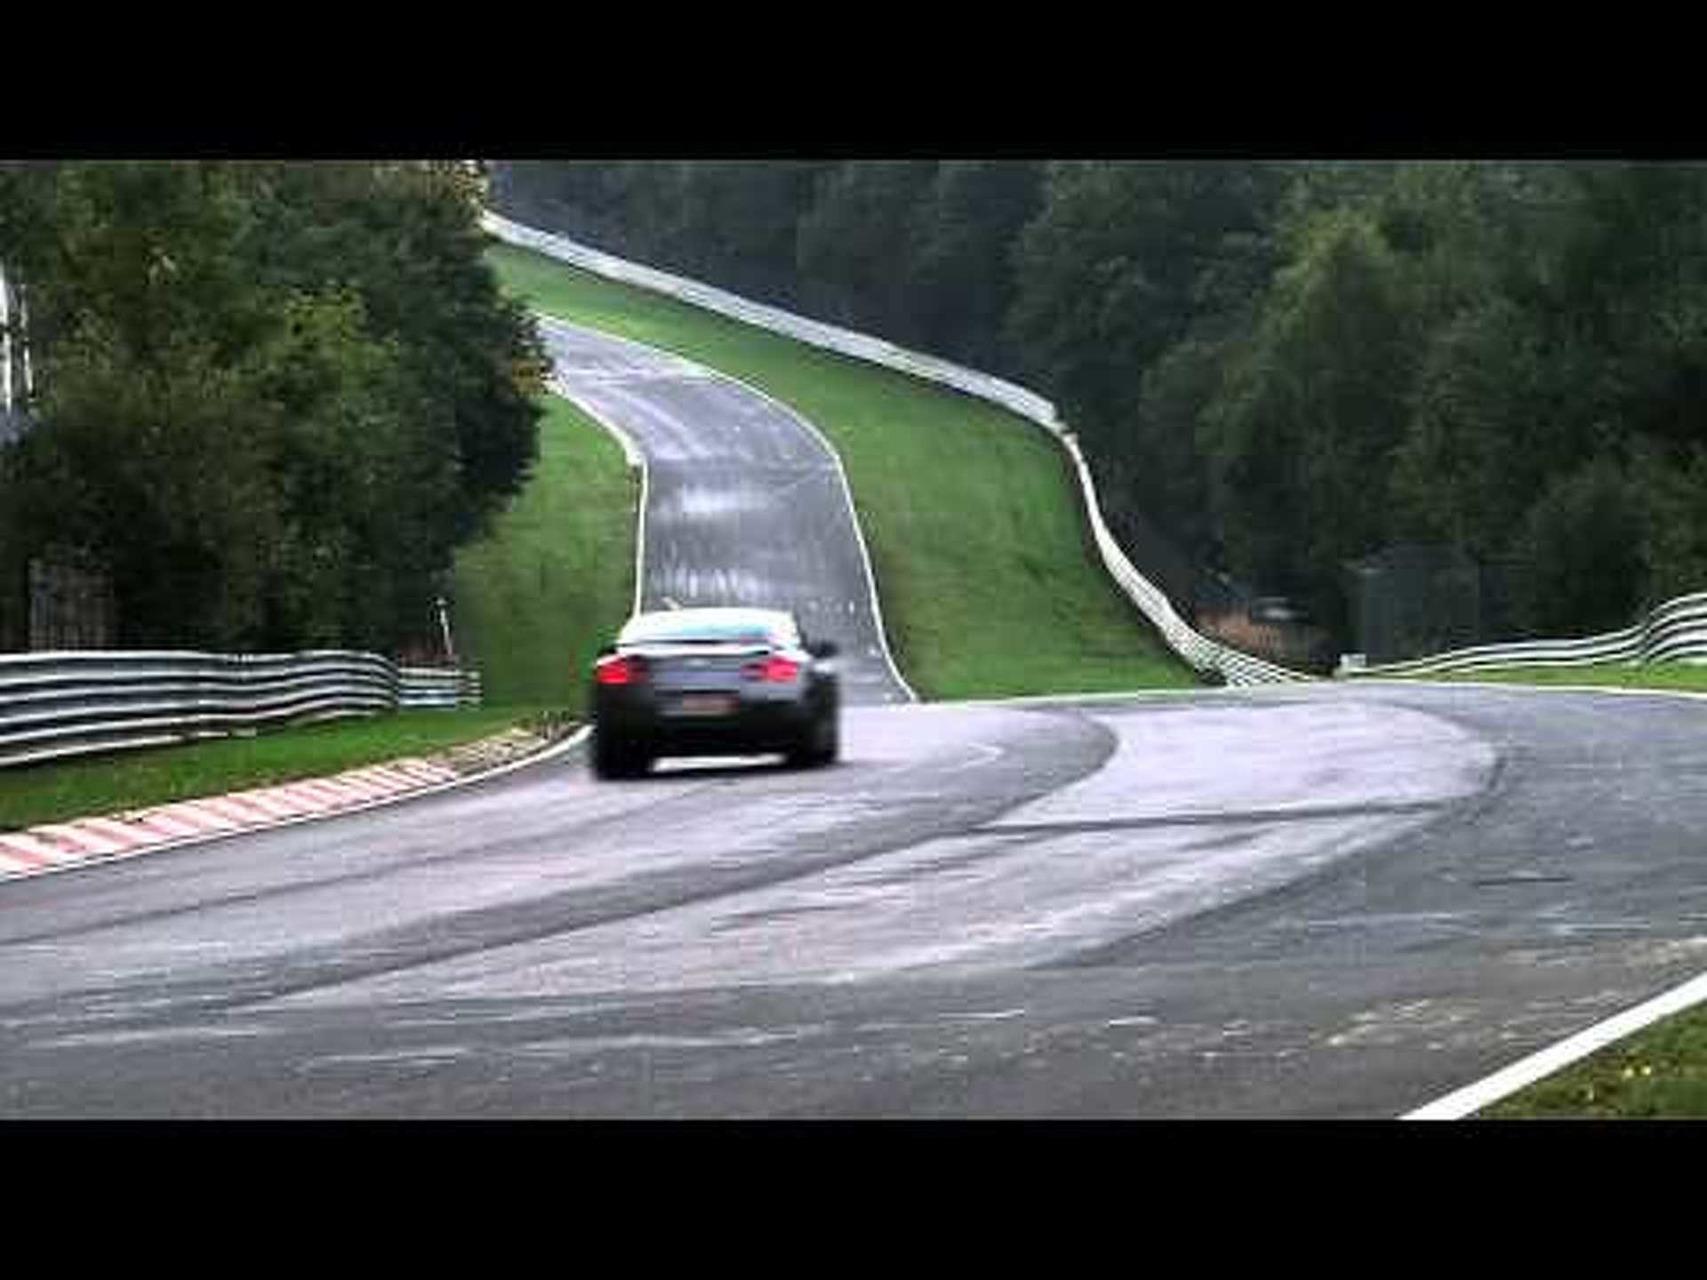 2012 Nissan GT-R Video Footage